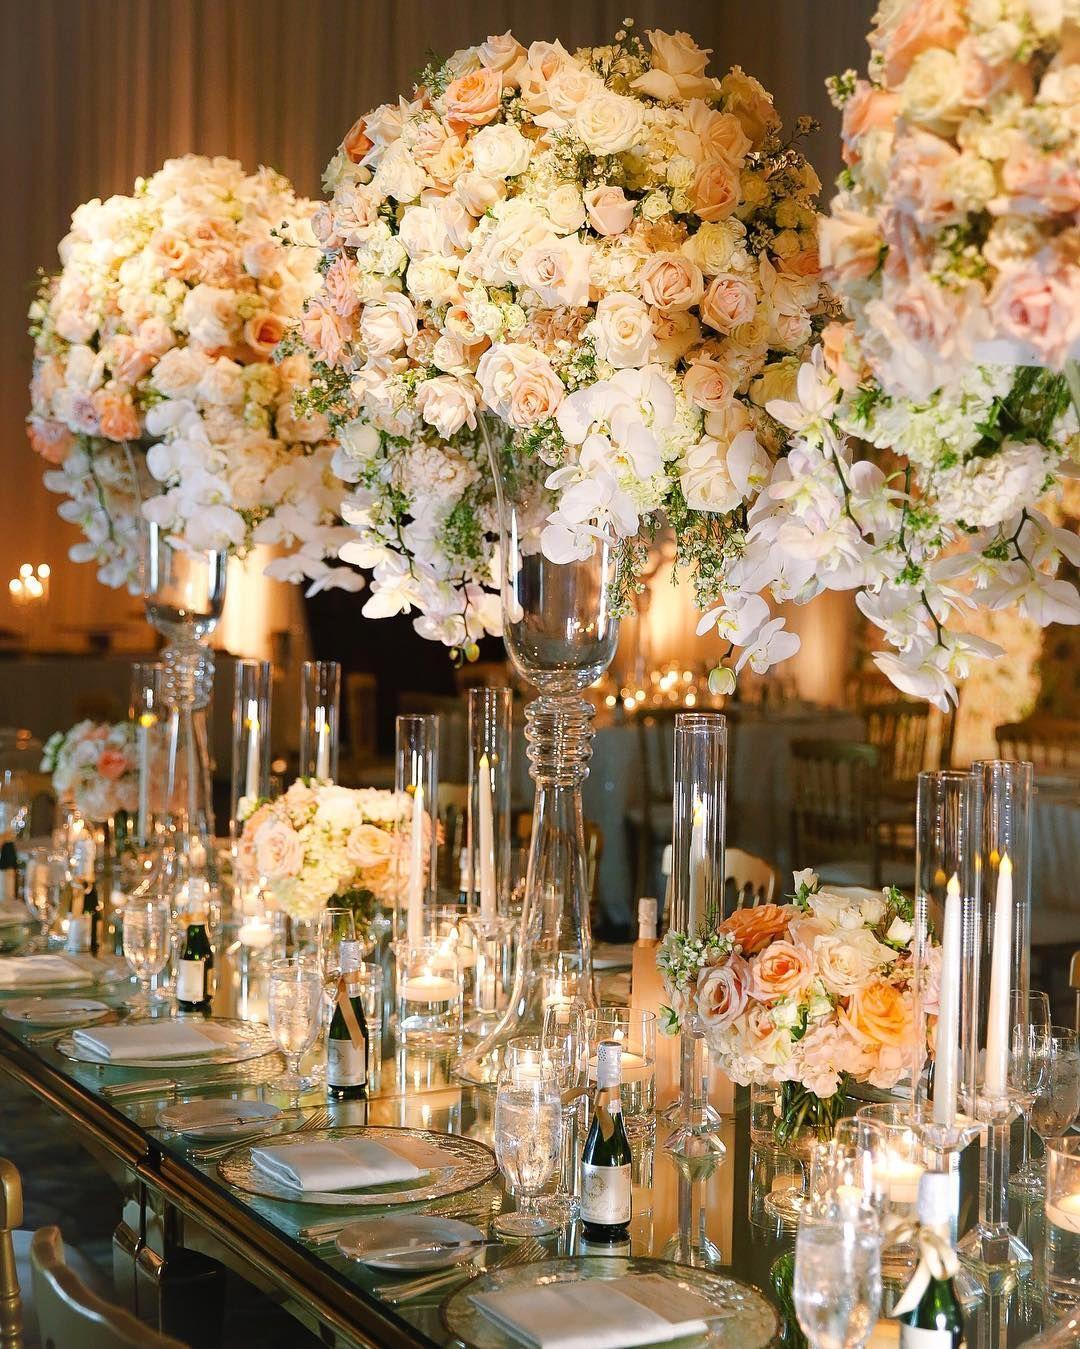 Celebrity Wedding Flowers Centerpieces: Celebrity Florist Based In LA, Travels Internationally